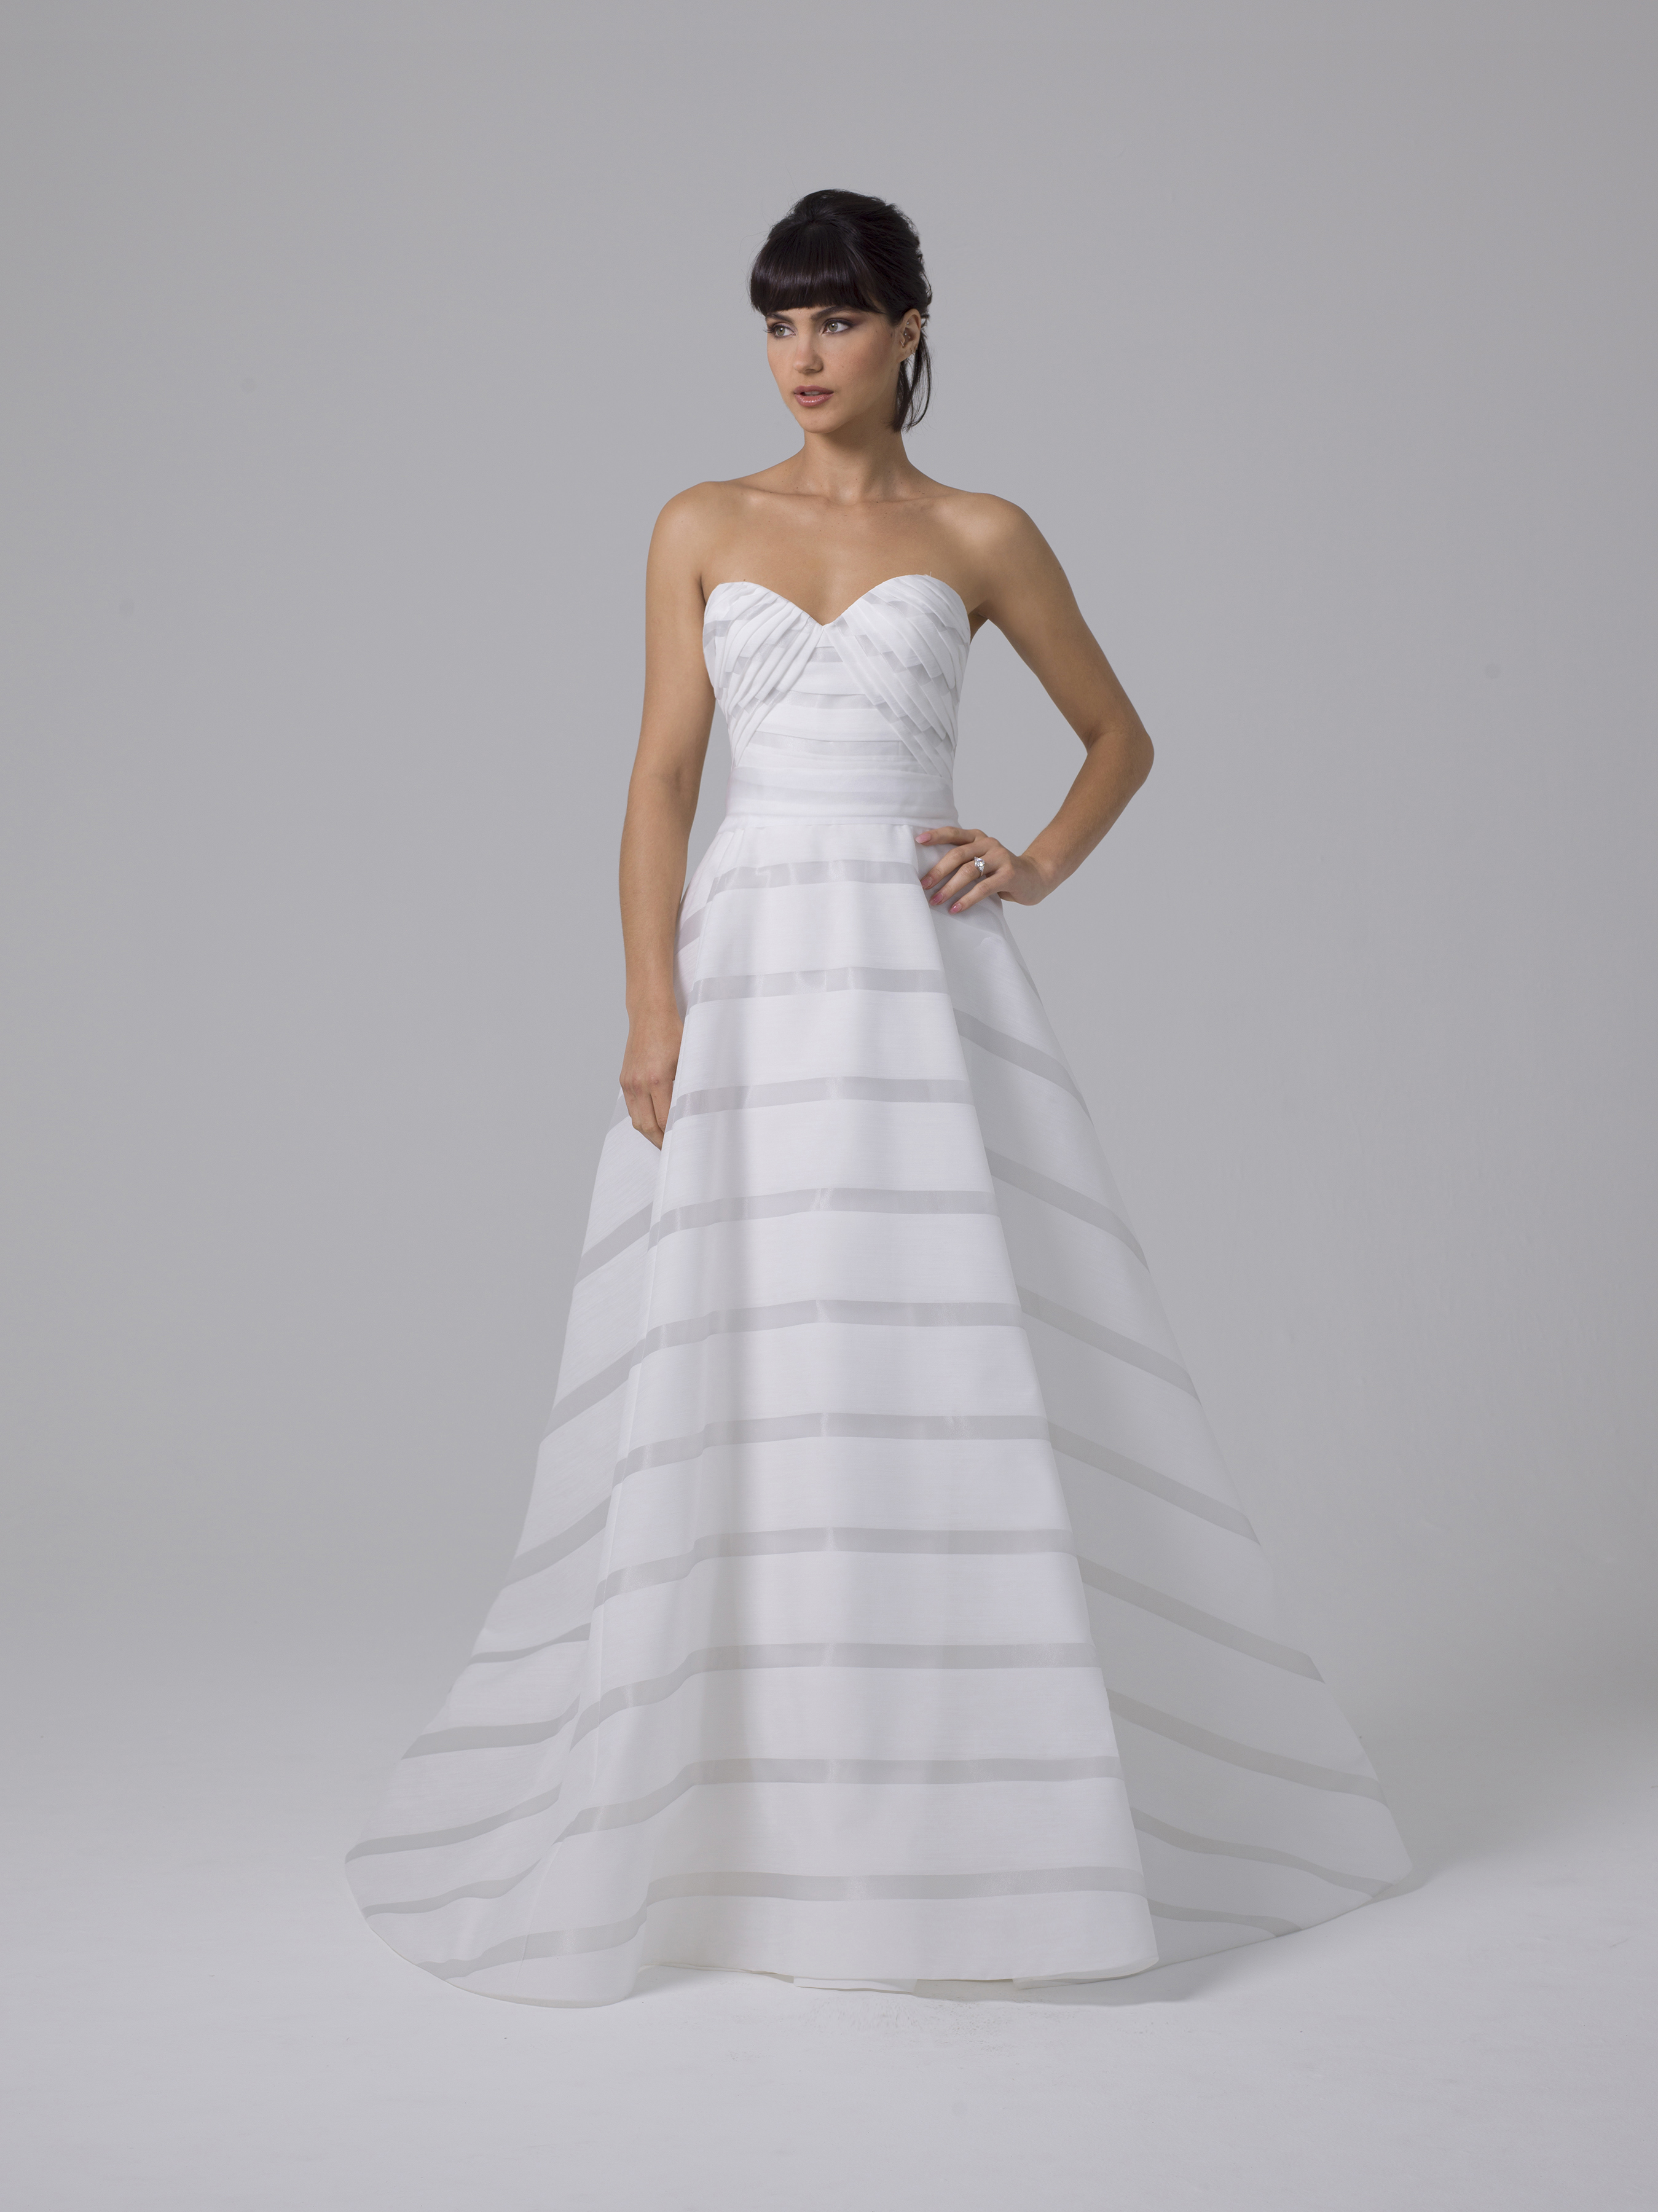 Liancarlo wedding dress with horizontal stripes fall 2019